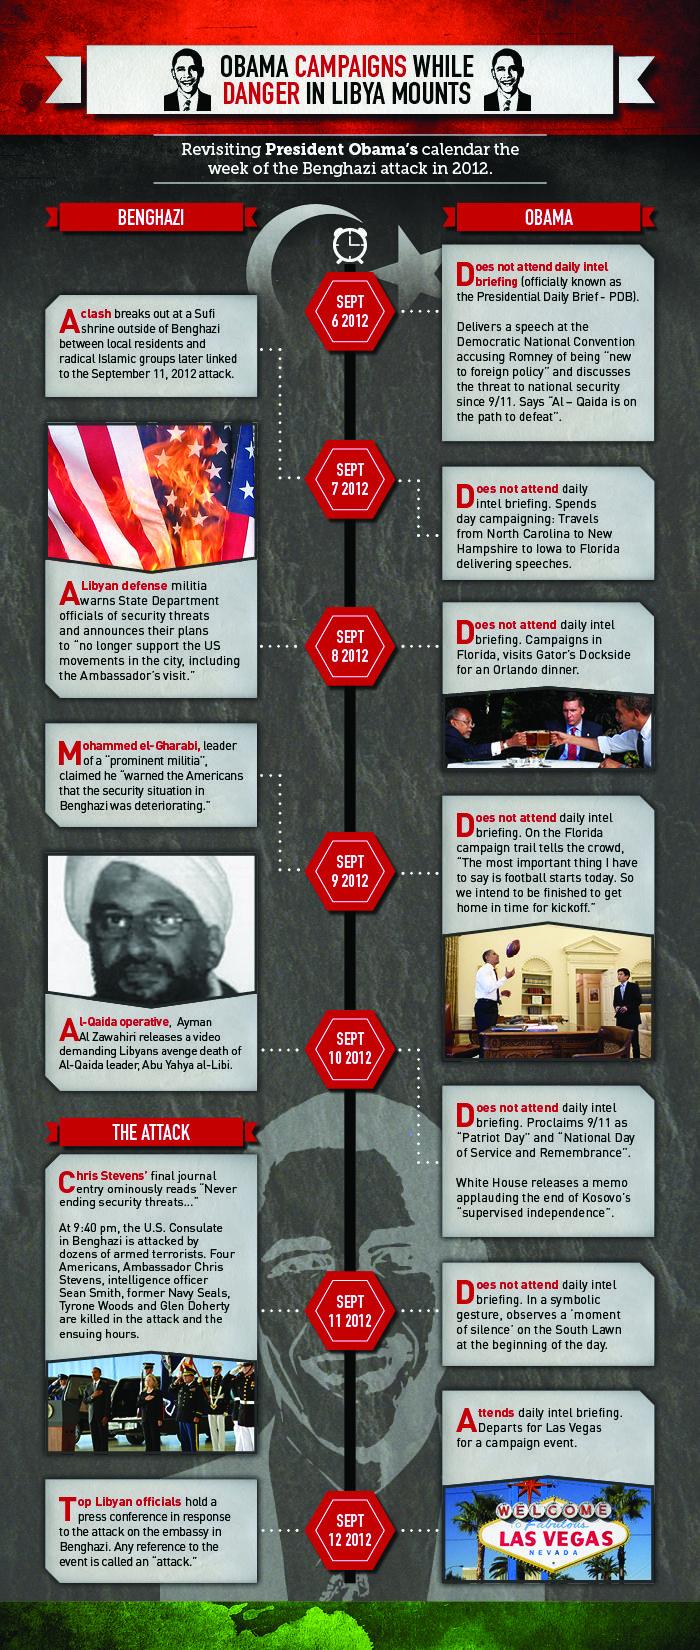 Devastating Obama Timeline Leading Up To Benghazi Attack...